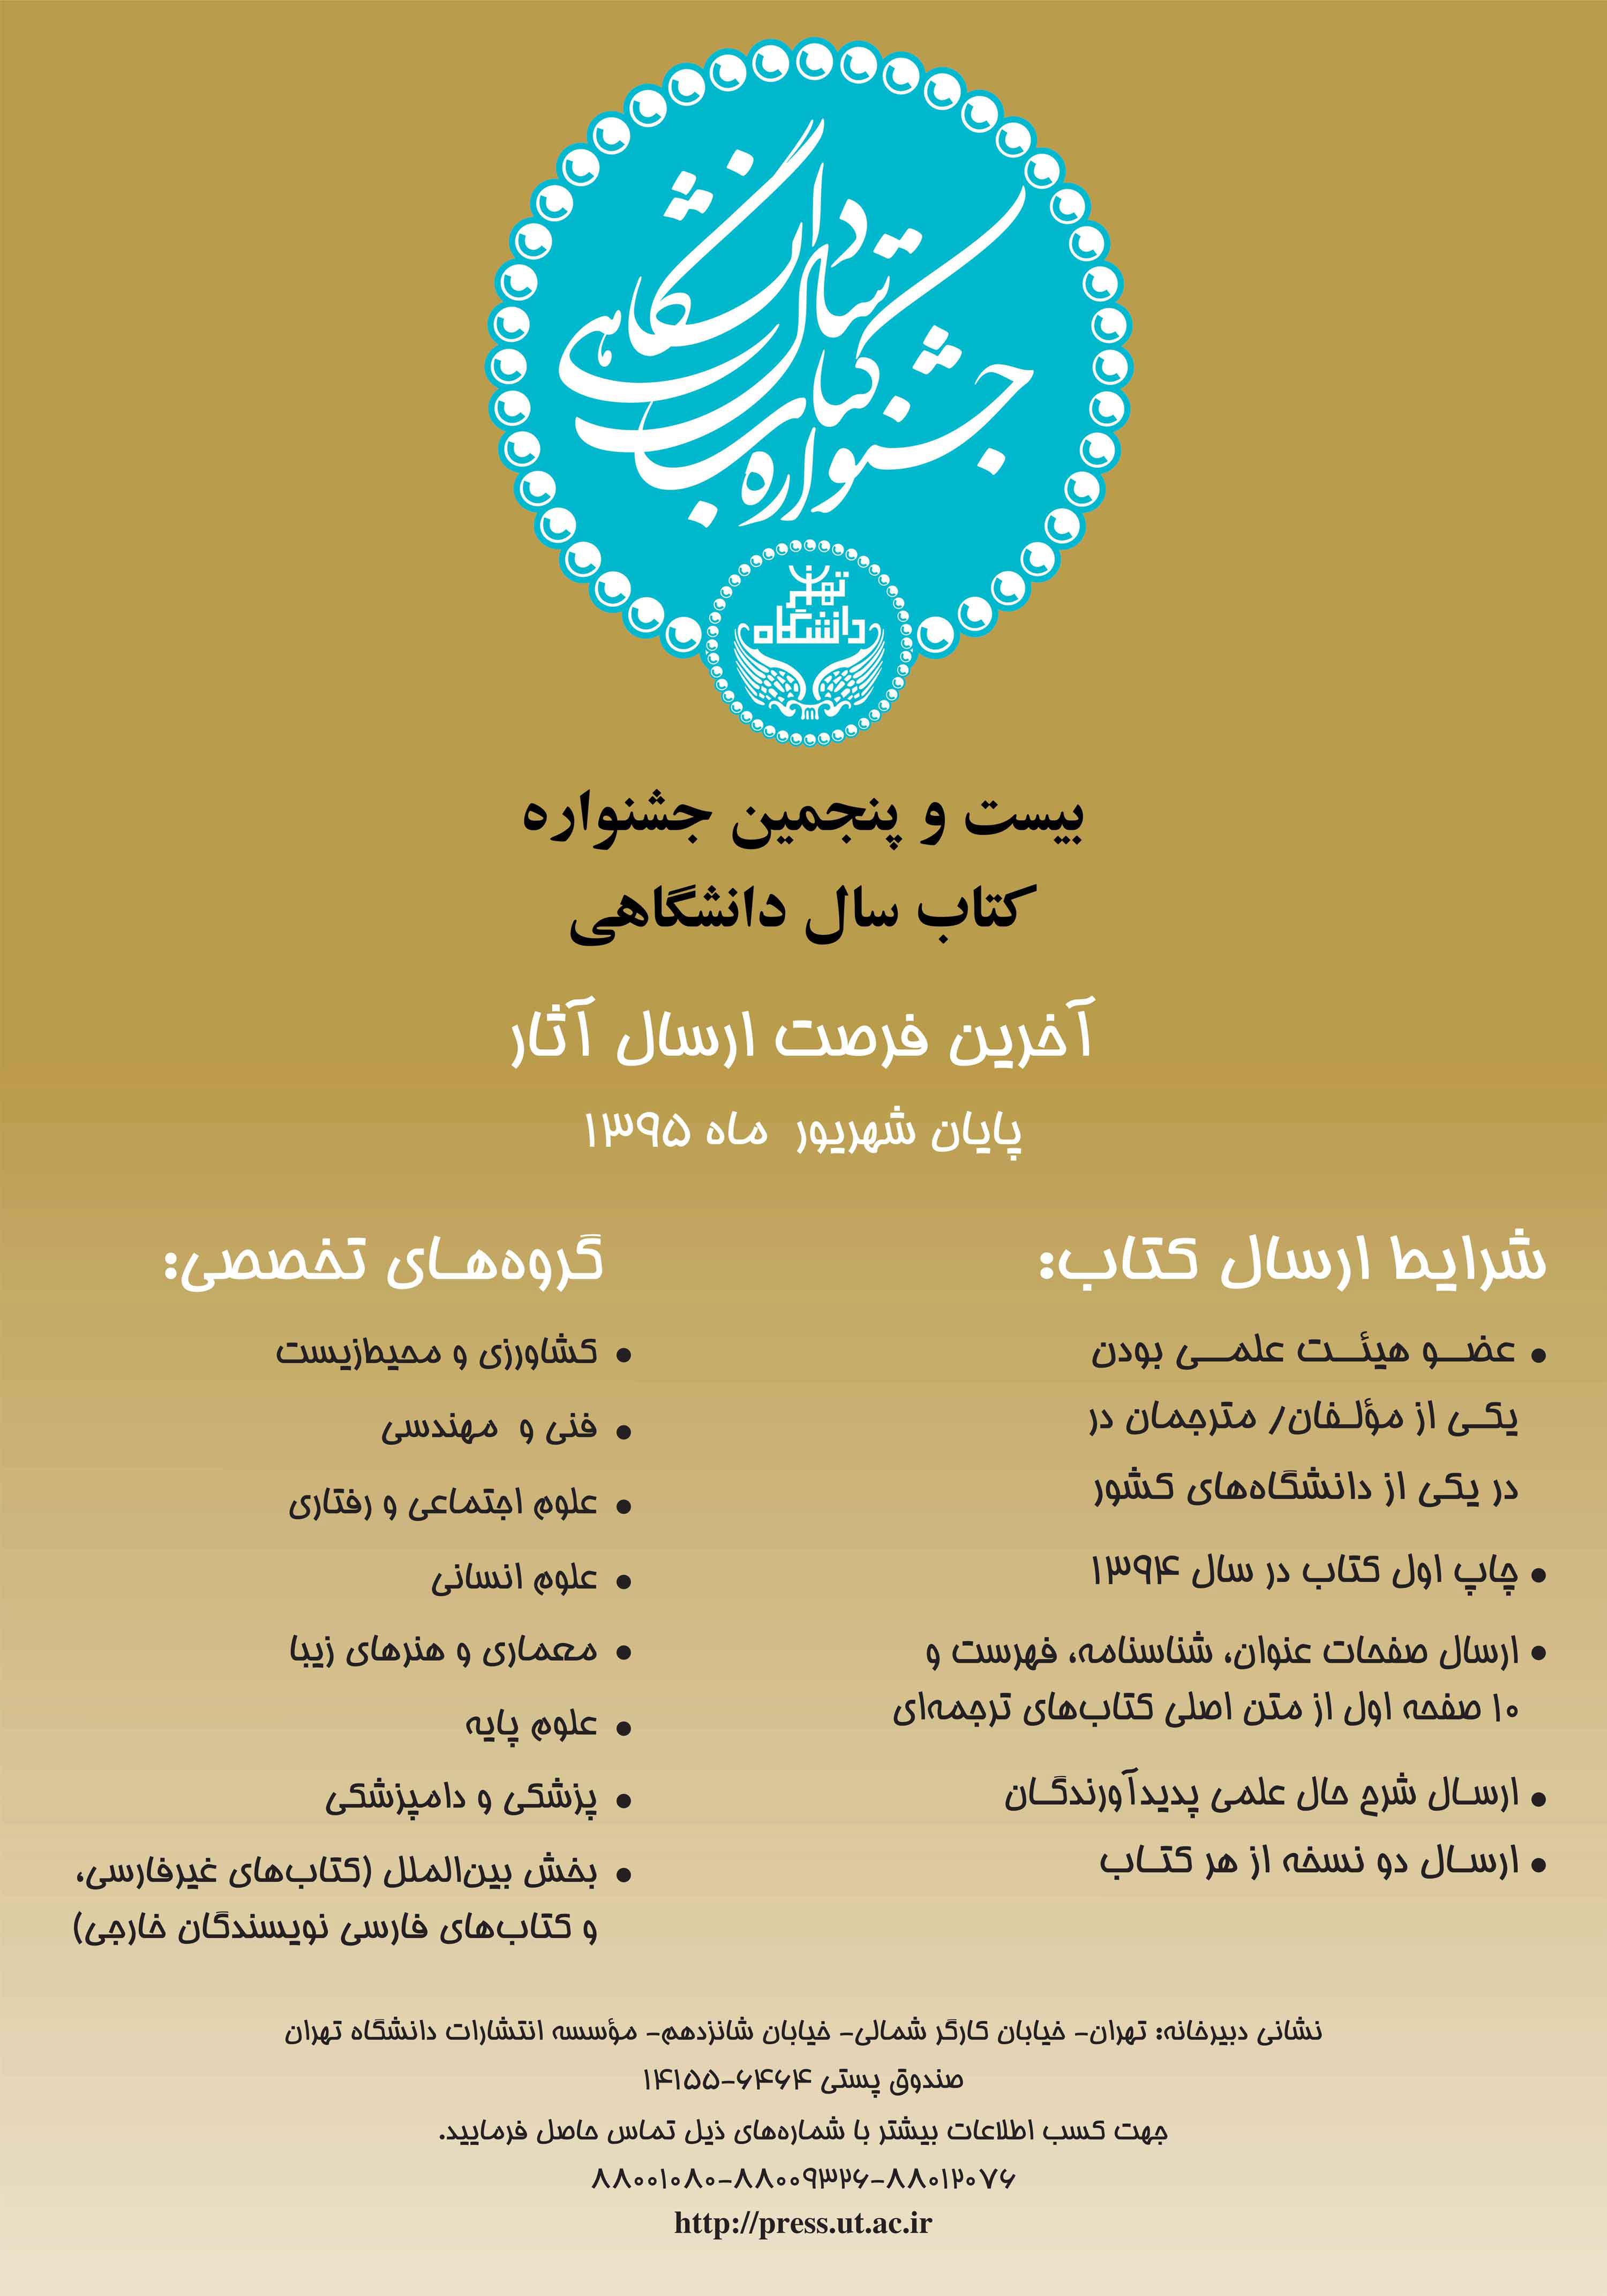 poster-ketab-daneshgahi